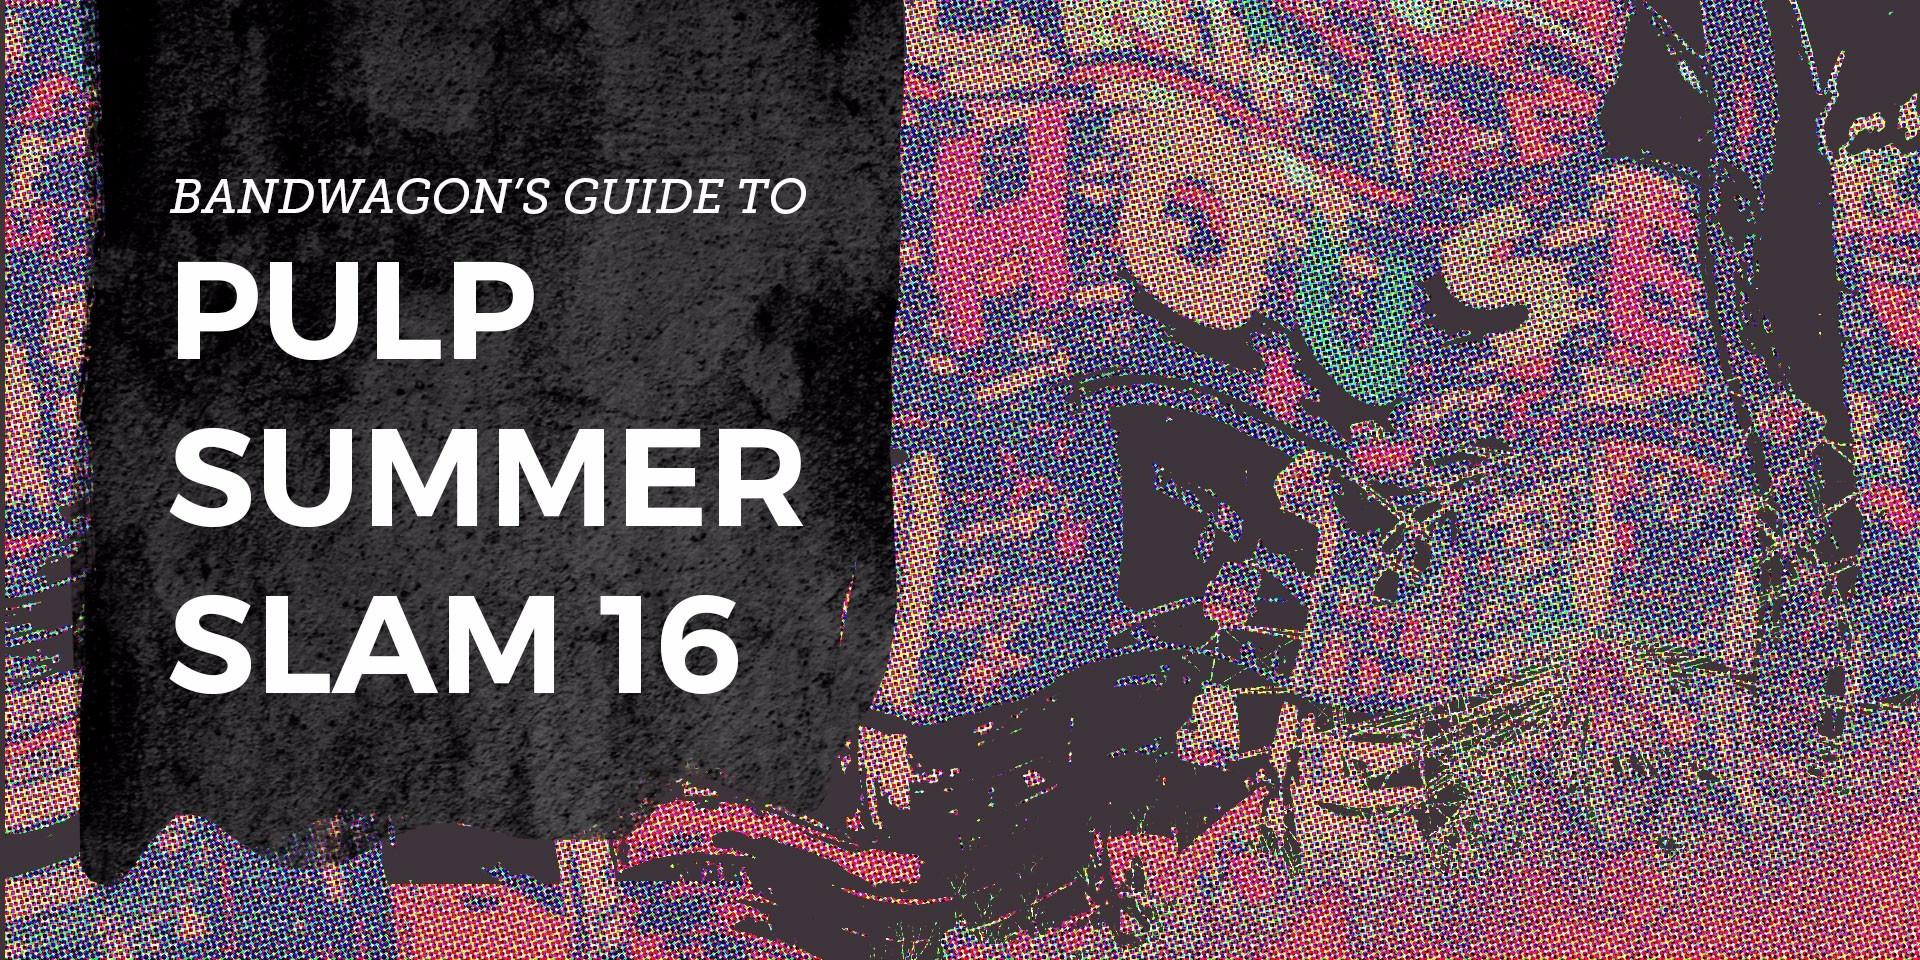 Bandwagon's Guide to Pulp Summer Slam 16